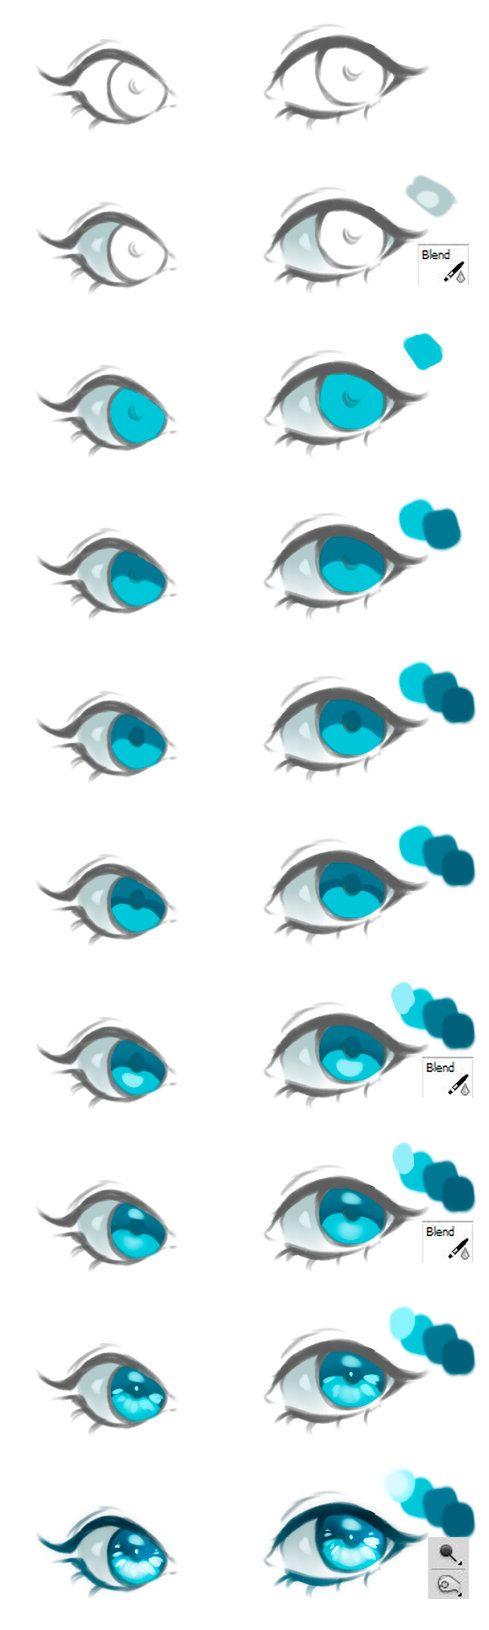 Anime Eyes Coloring Tutorial Vol 2 By Haloblabla On Deviantart Anime Drawings Tutorials Art Tutorials Digital Art Tutorial